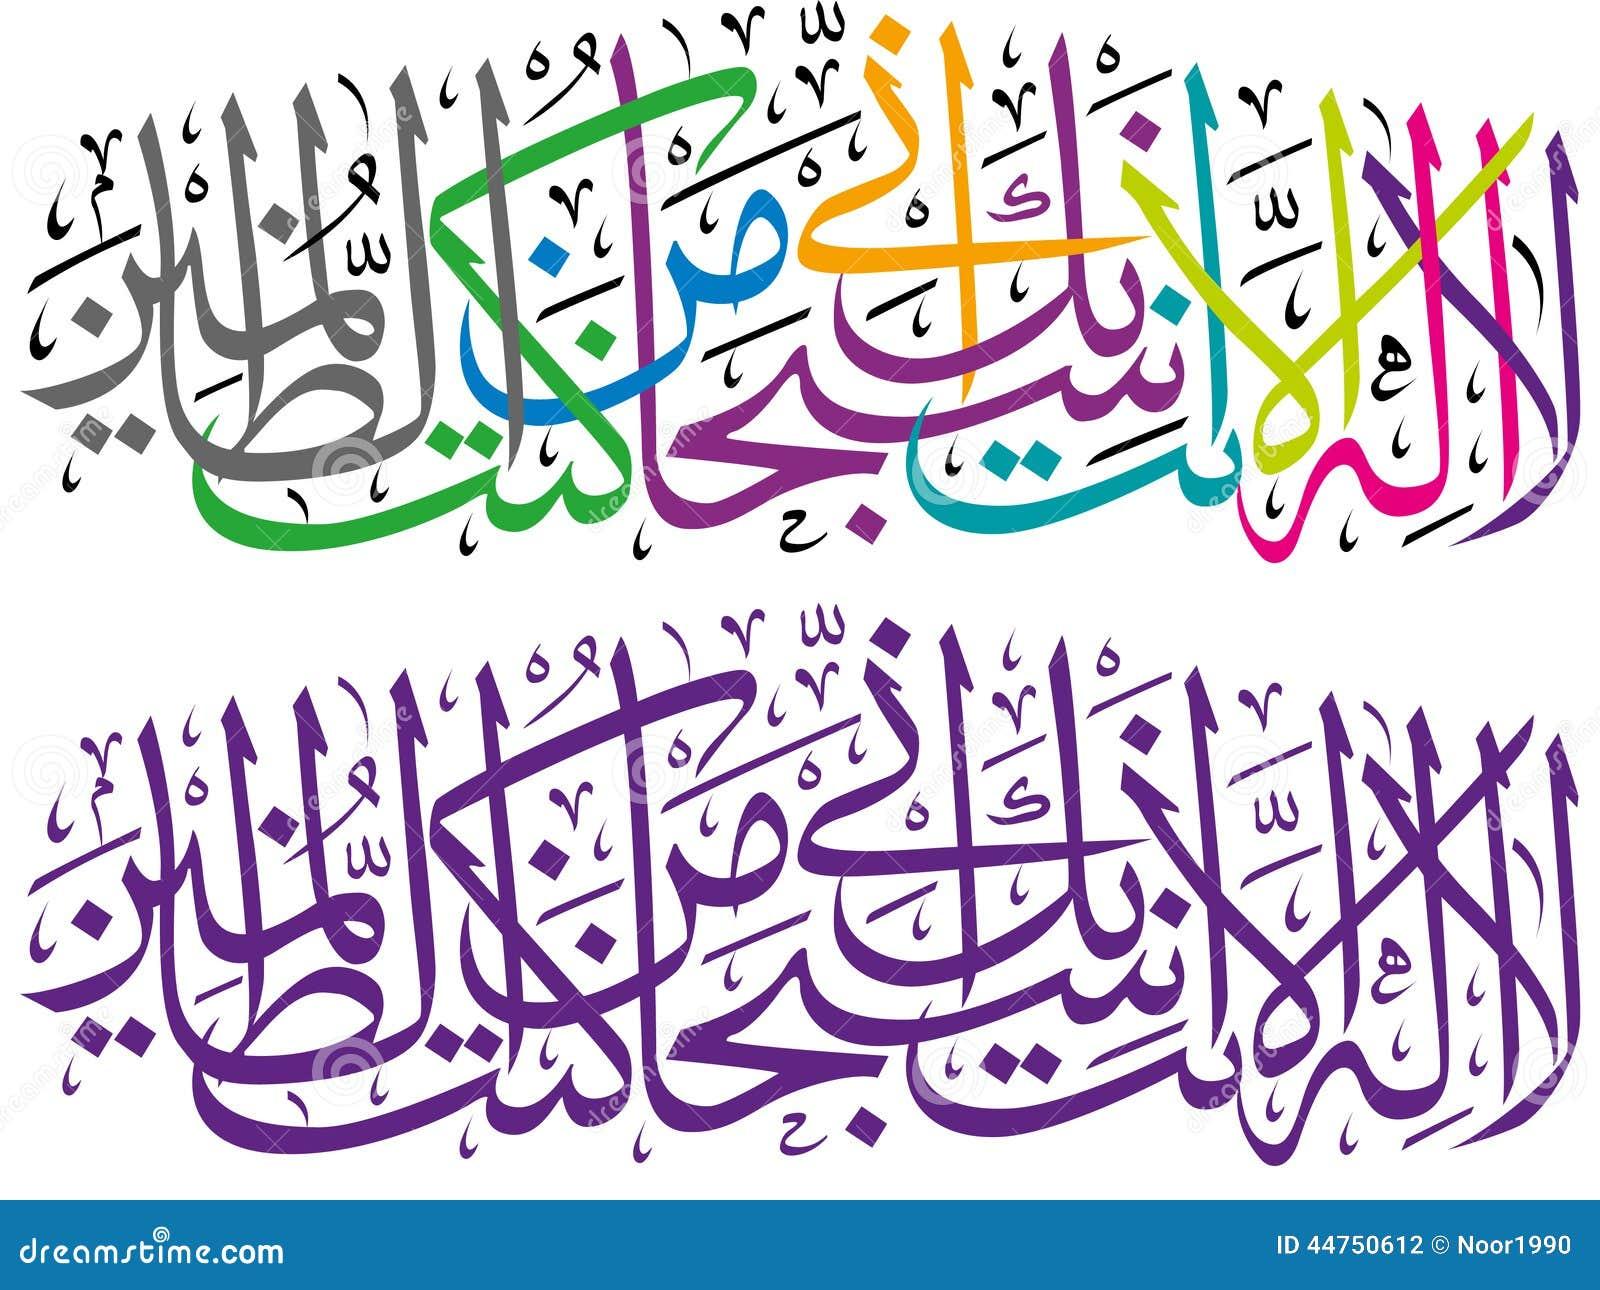 Arabic calligraphy stock vector. Illustration of greeting 21790967.